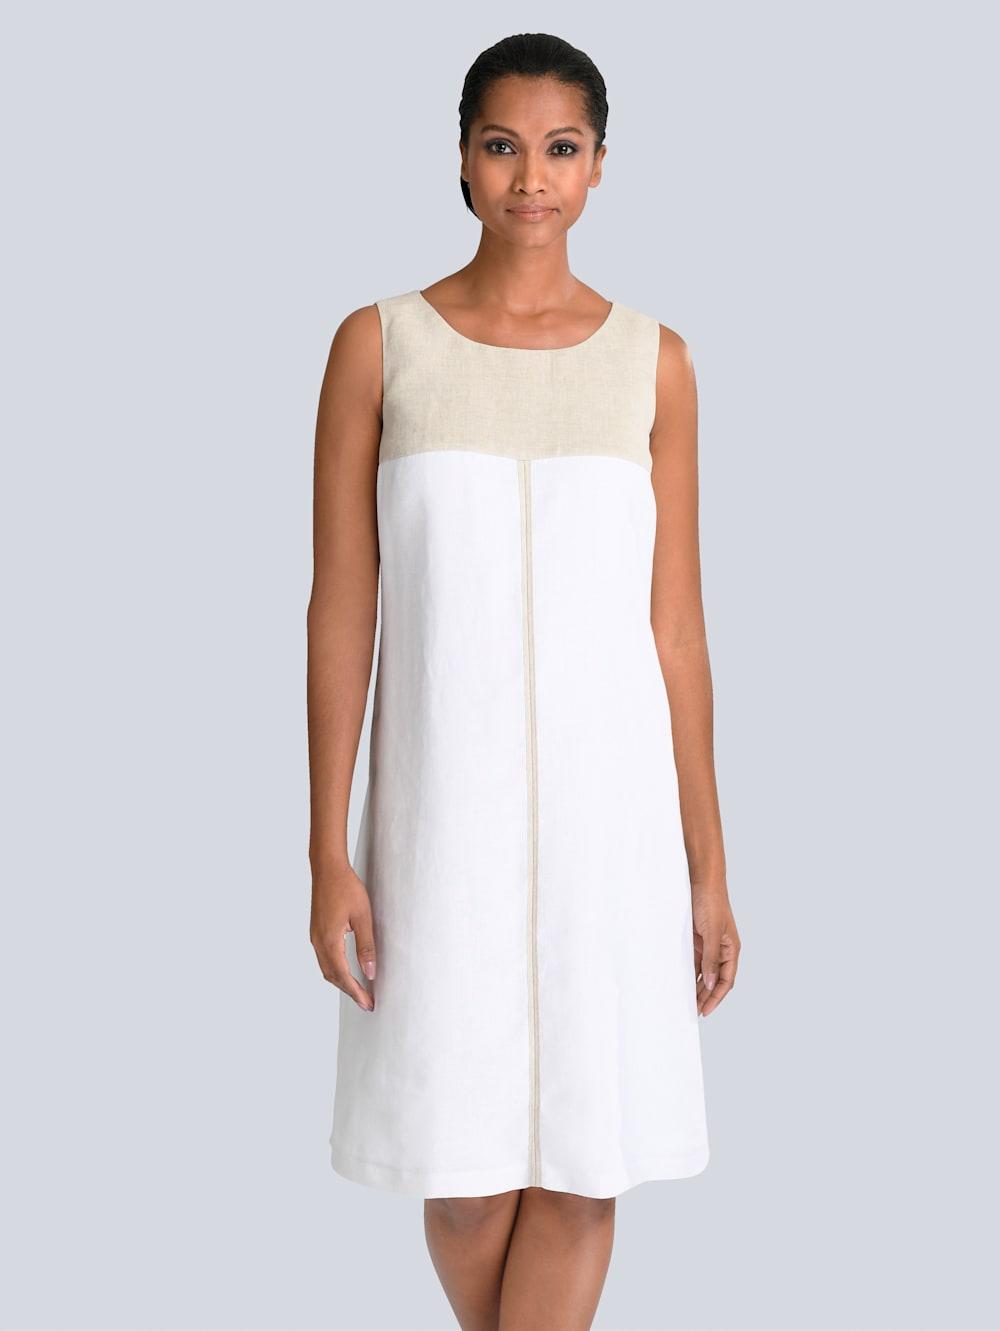 alba moda kleid aus edlem leinen | alba moda